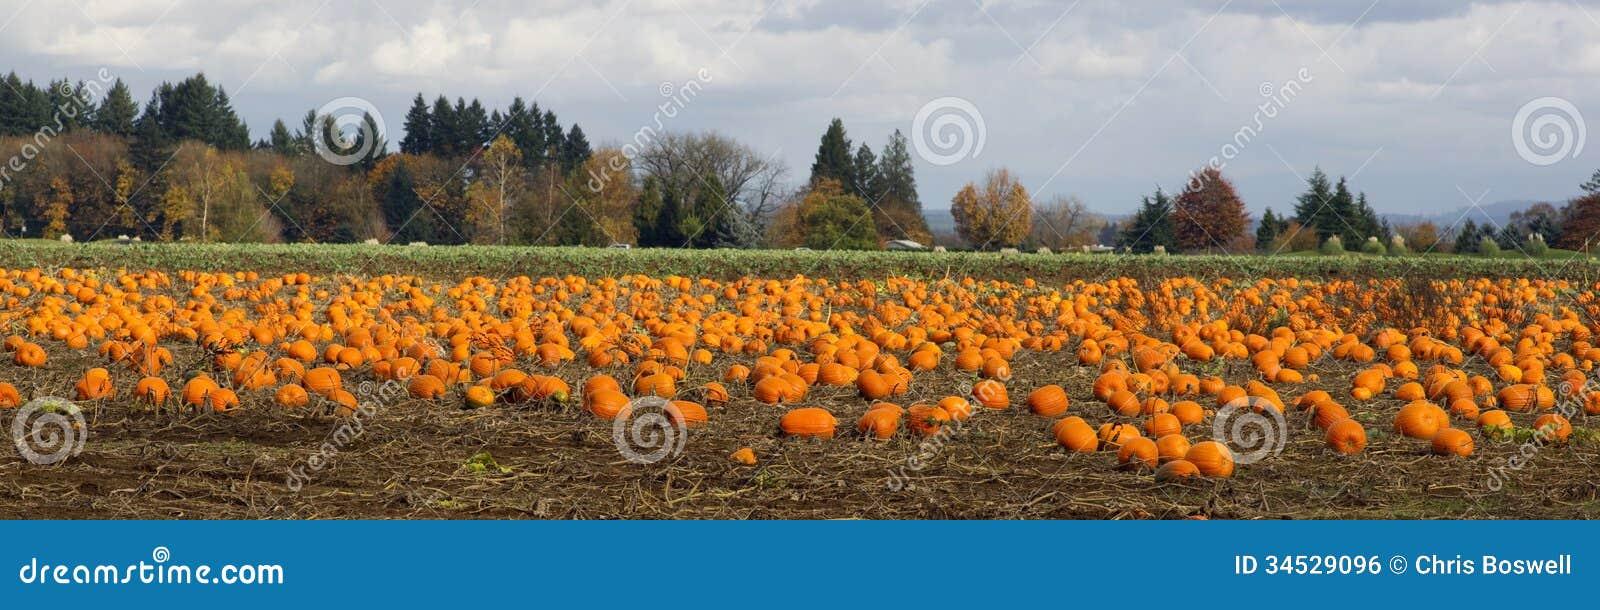 Сбор панорамных овощей заплаты тыквы поля фермы сцены зрелый